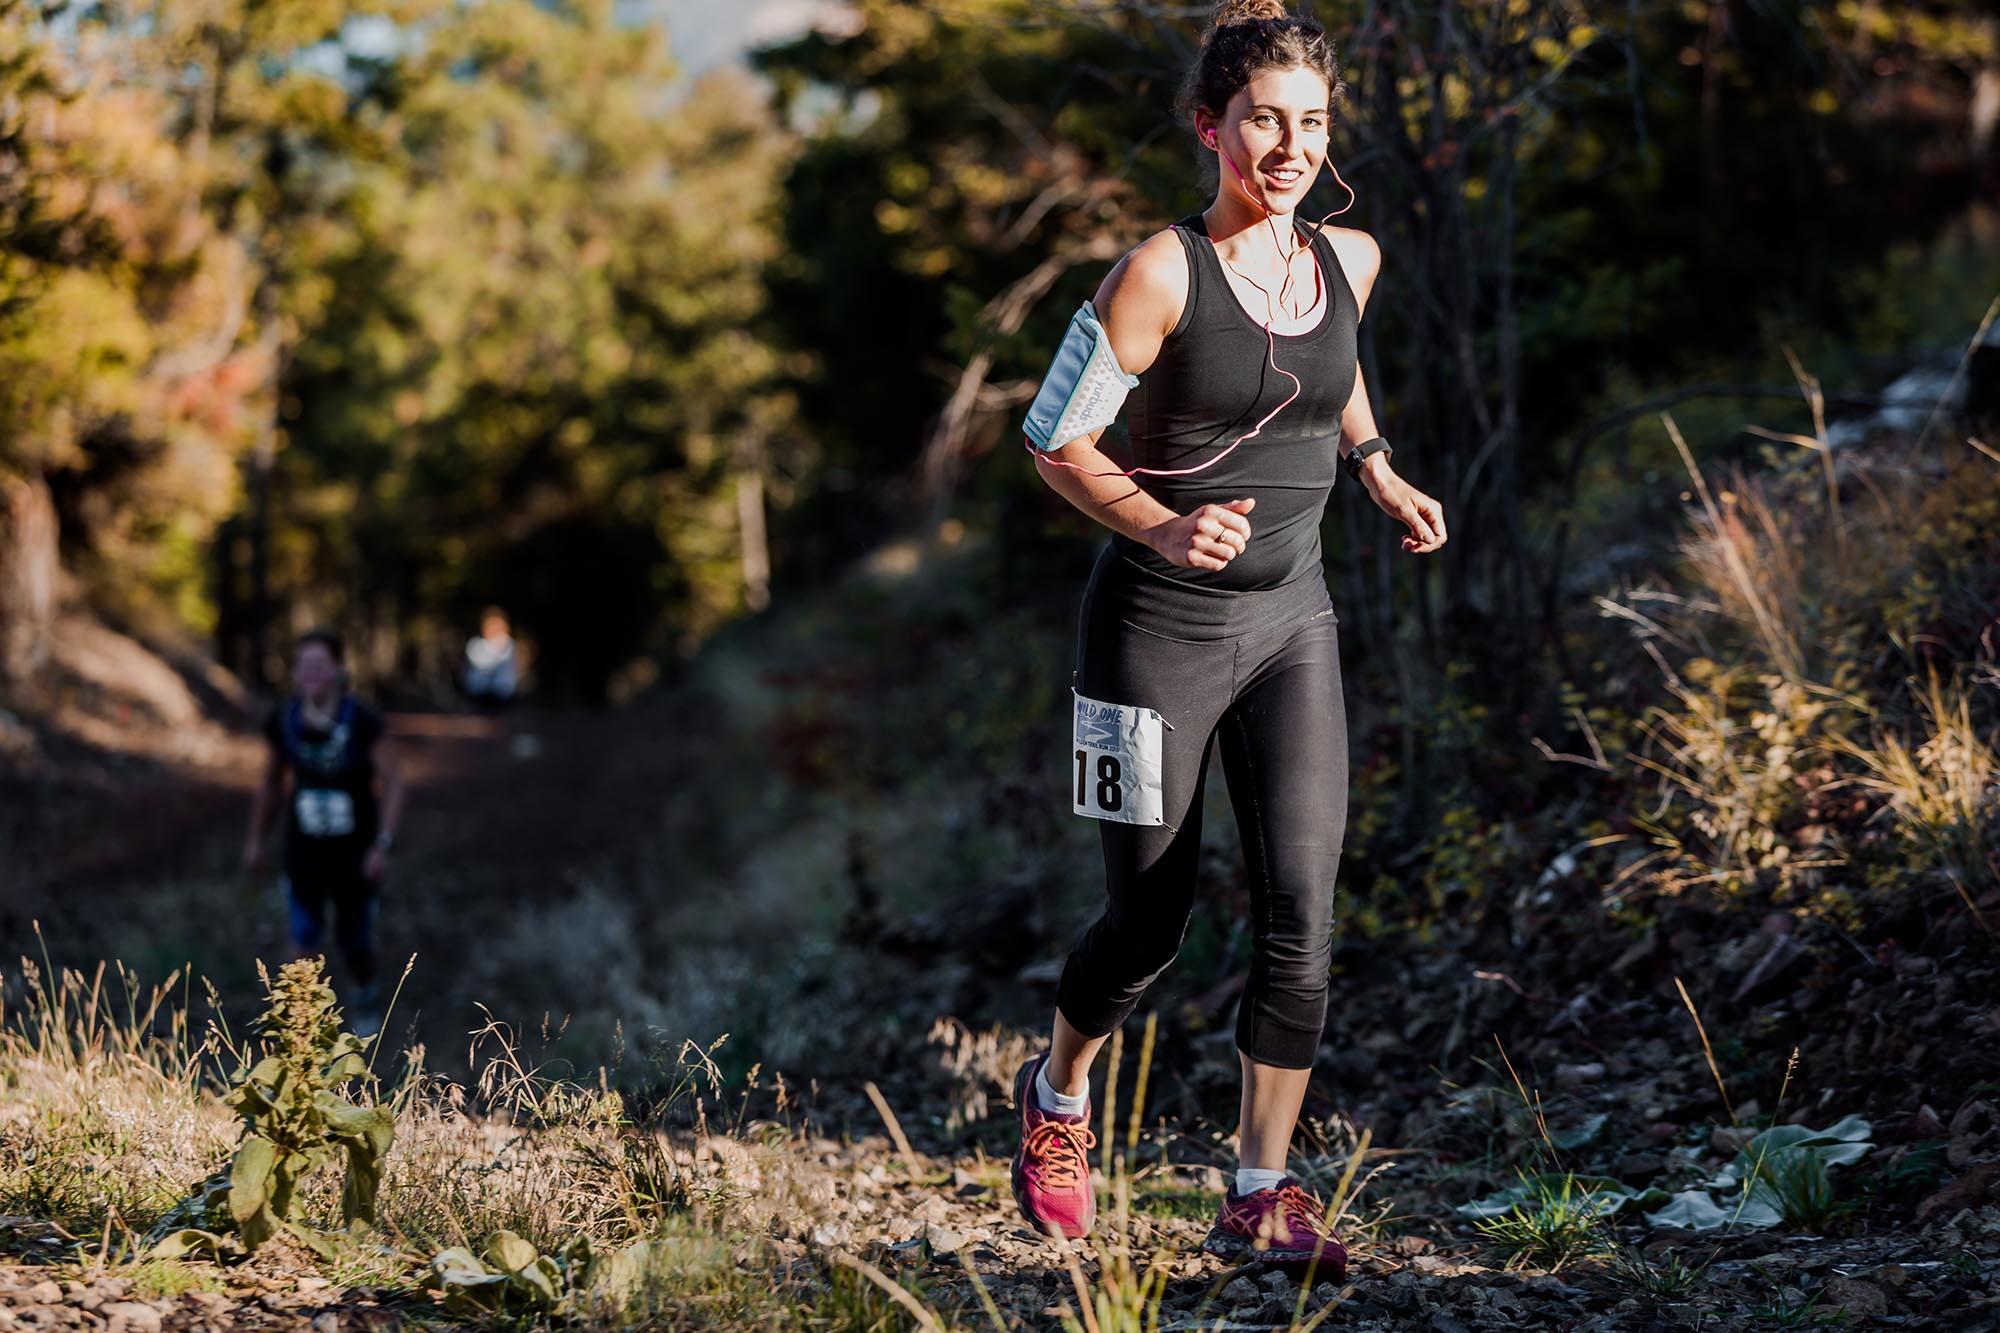 Wilden Wild One Run, Kelowna Trail Run image